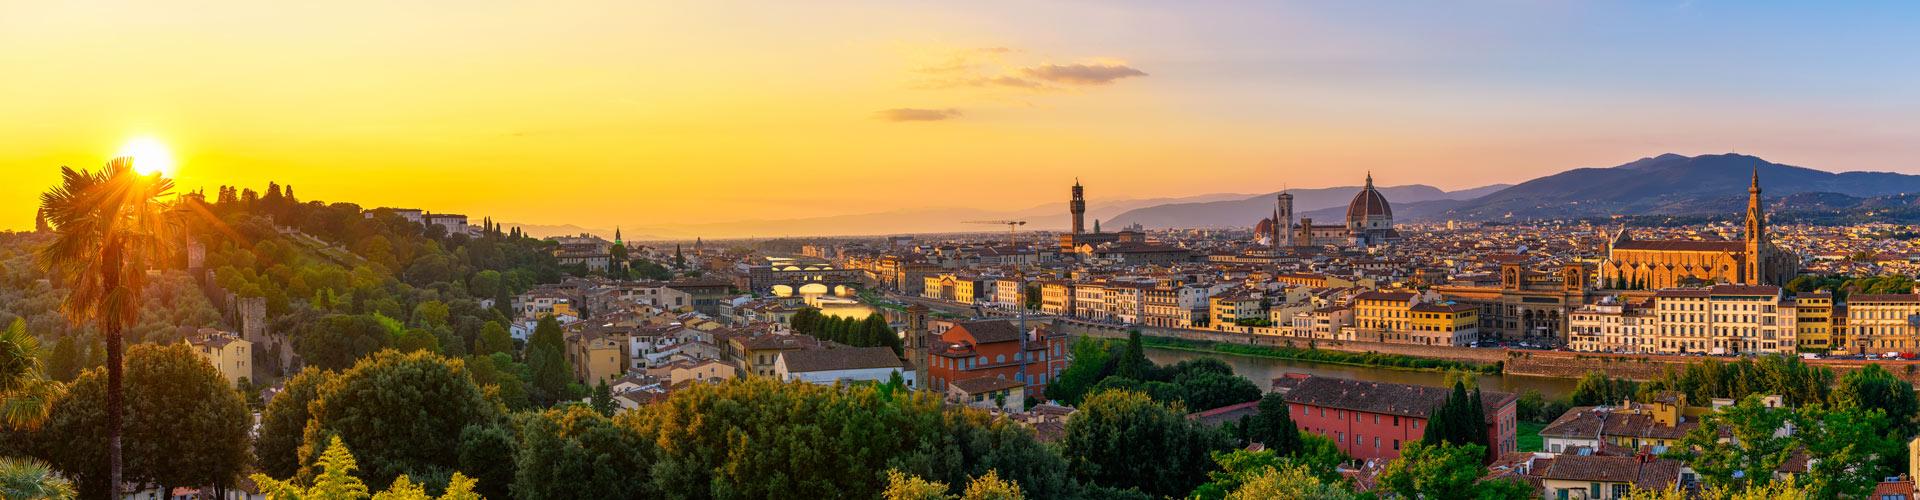 Firenze_AdobeStock_124399320_slider